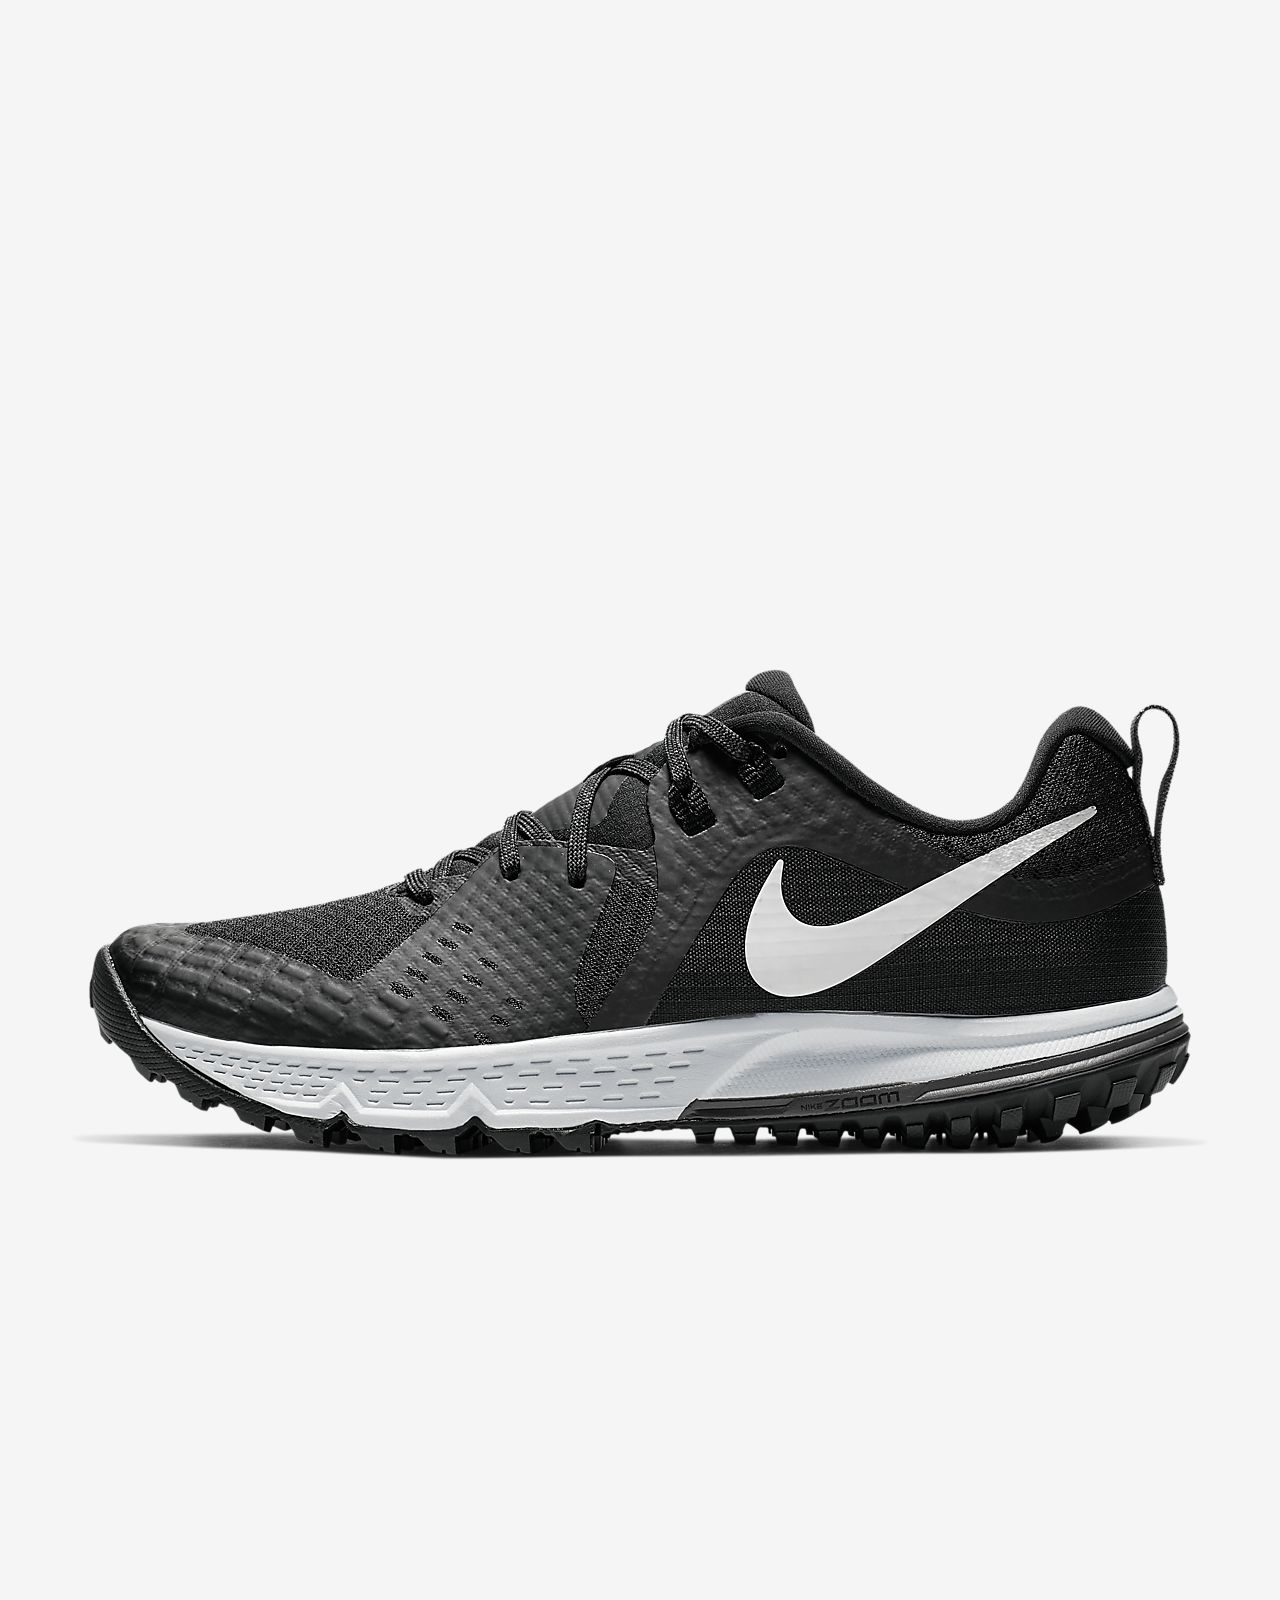 Chaussure de running sur sentier Nike Air Zoom Wildhorse 5 pour Femme